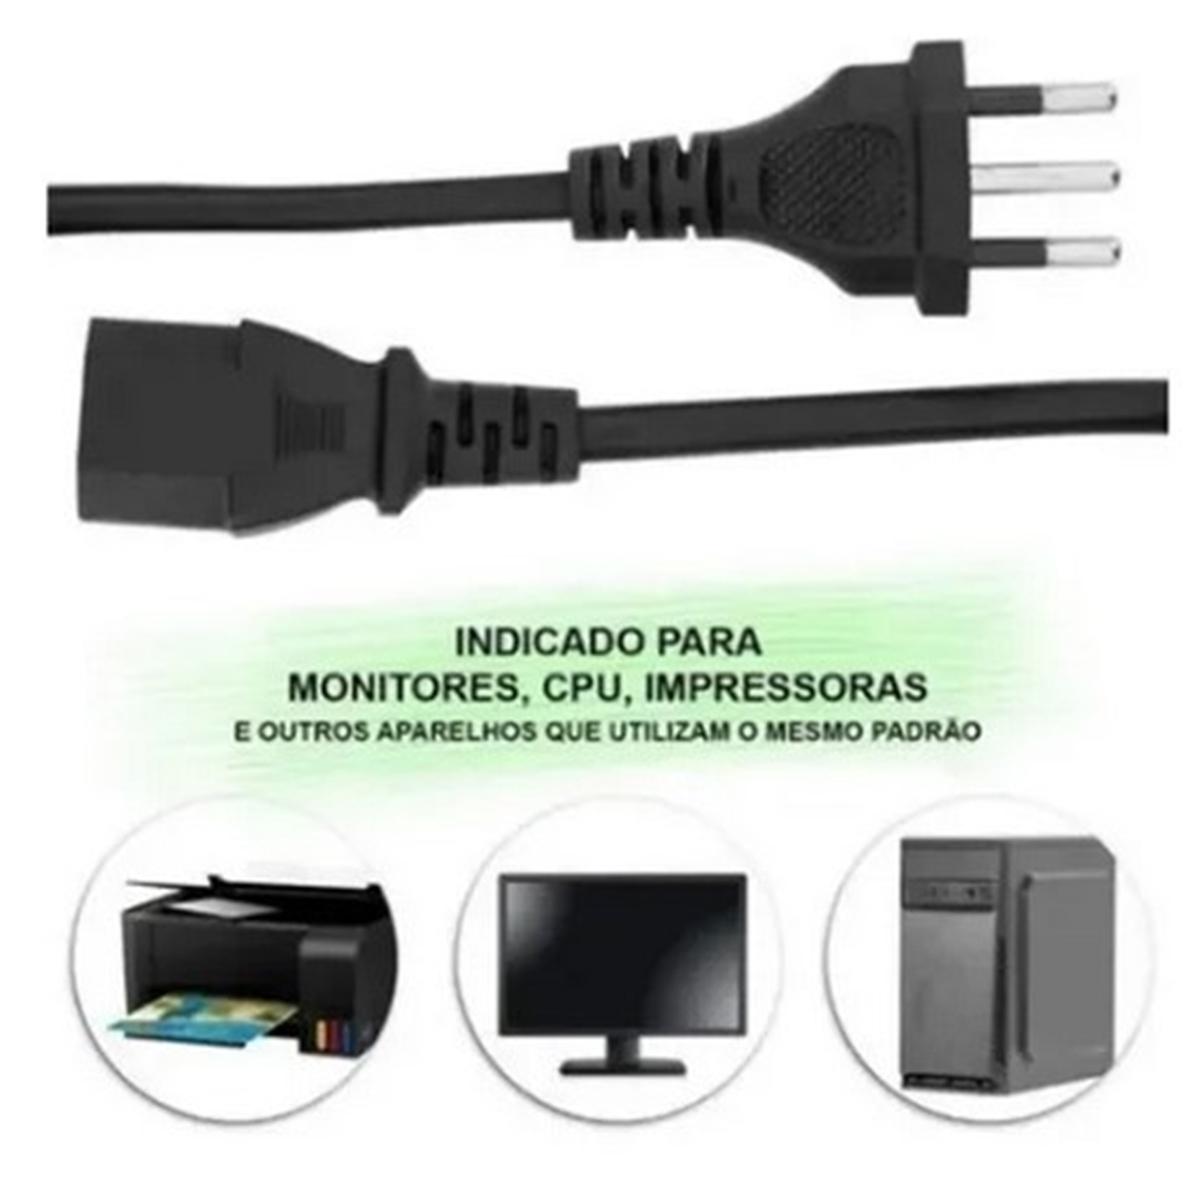 Kit 5 Cabo de Força Energia Tripolar 1,5M 10A / 250V PC Monitor Impressora CPU Goal - GL0296-5